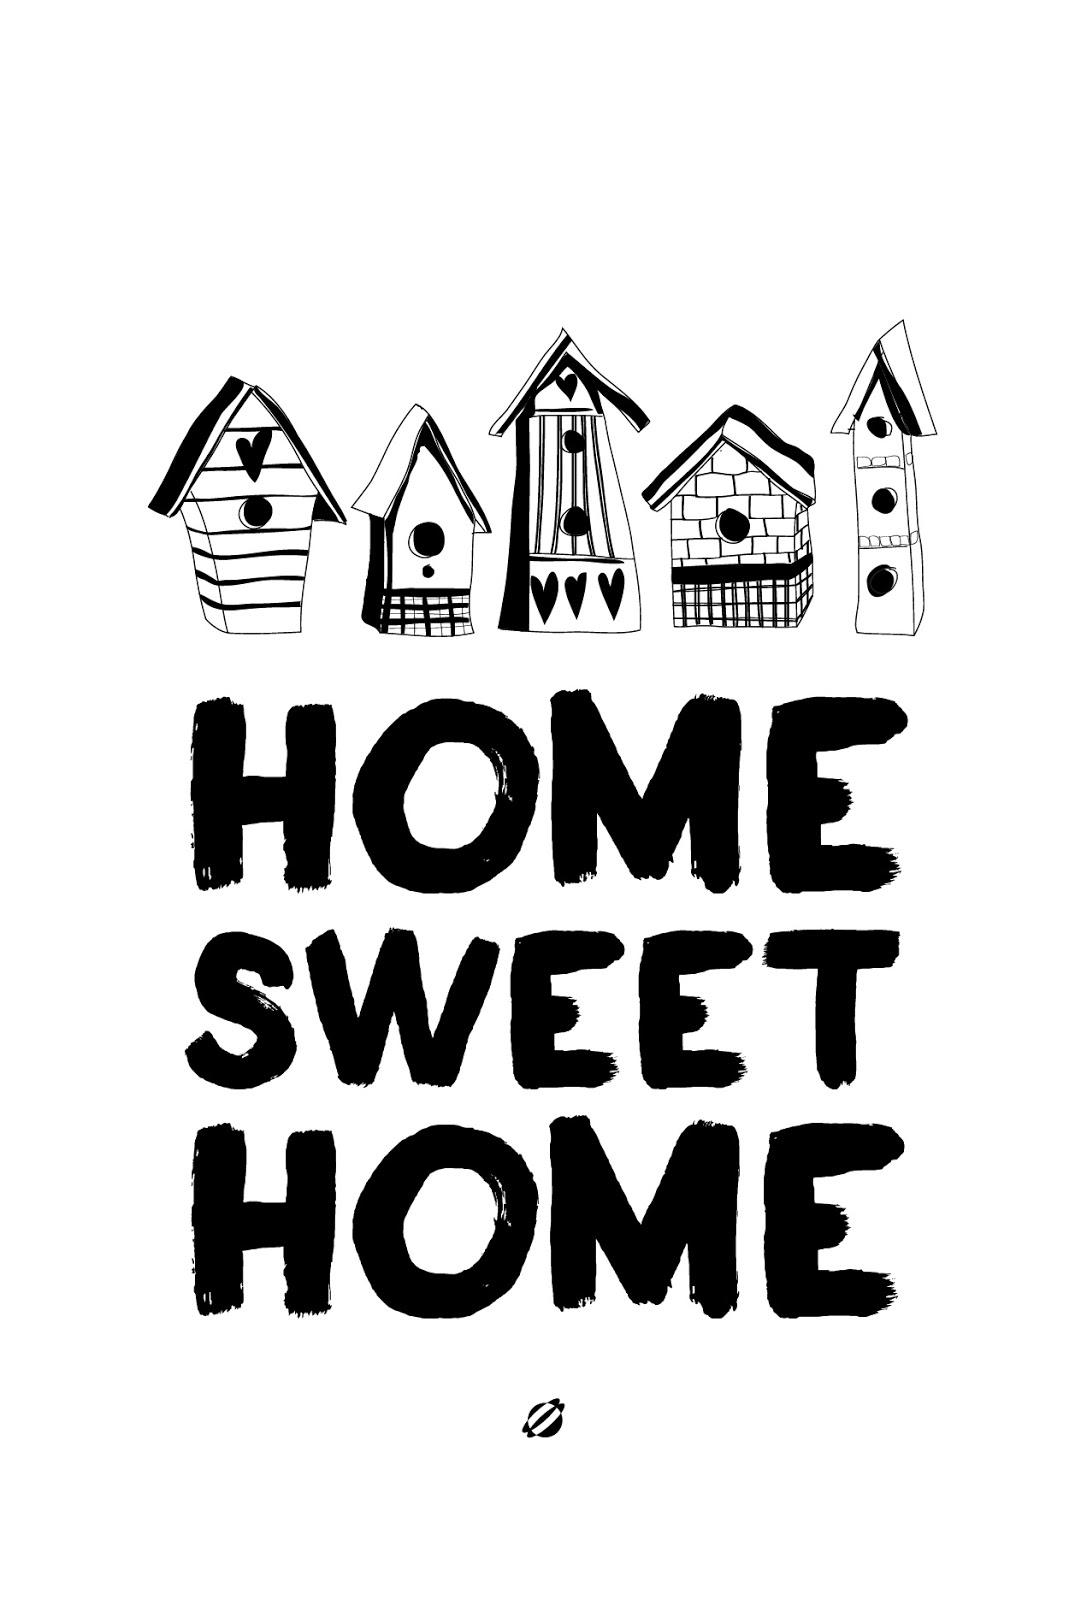 LostBumblebee ©2014 Home Sweet Home FREE PRINTABLE - BW